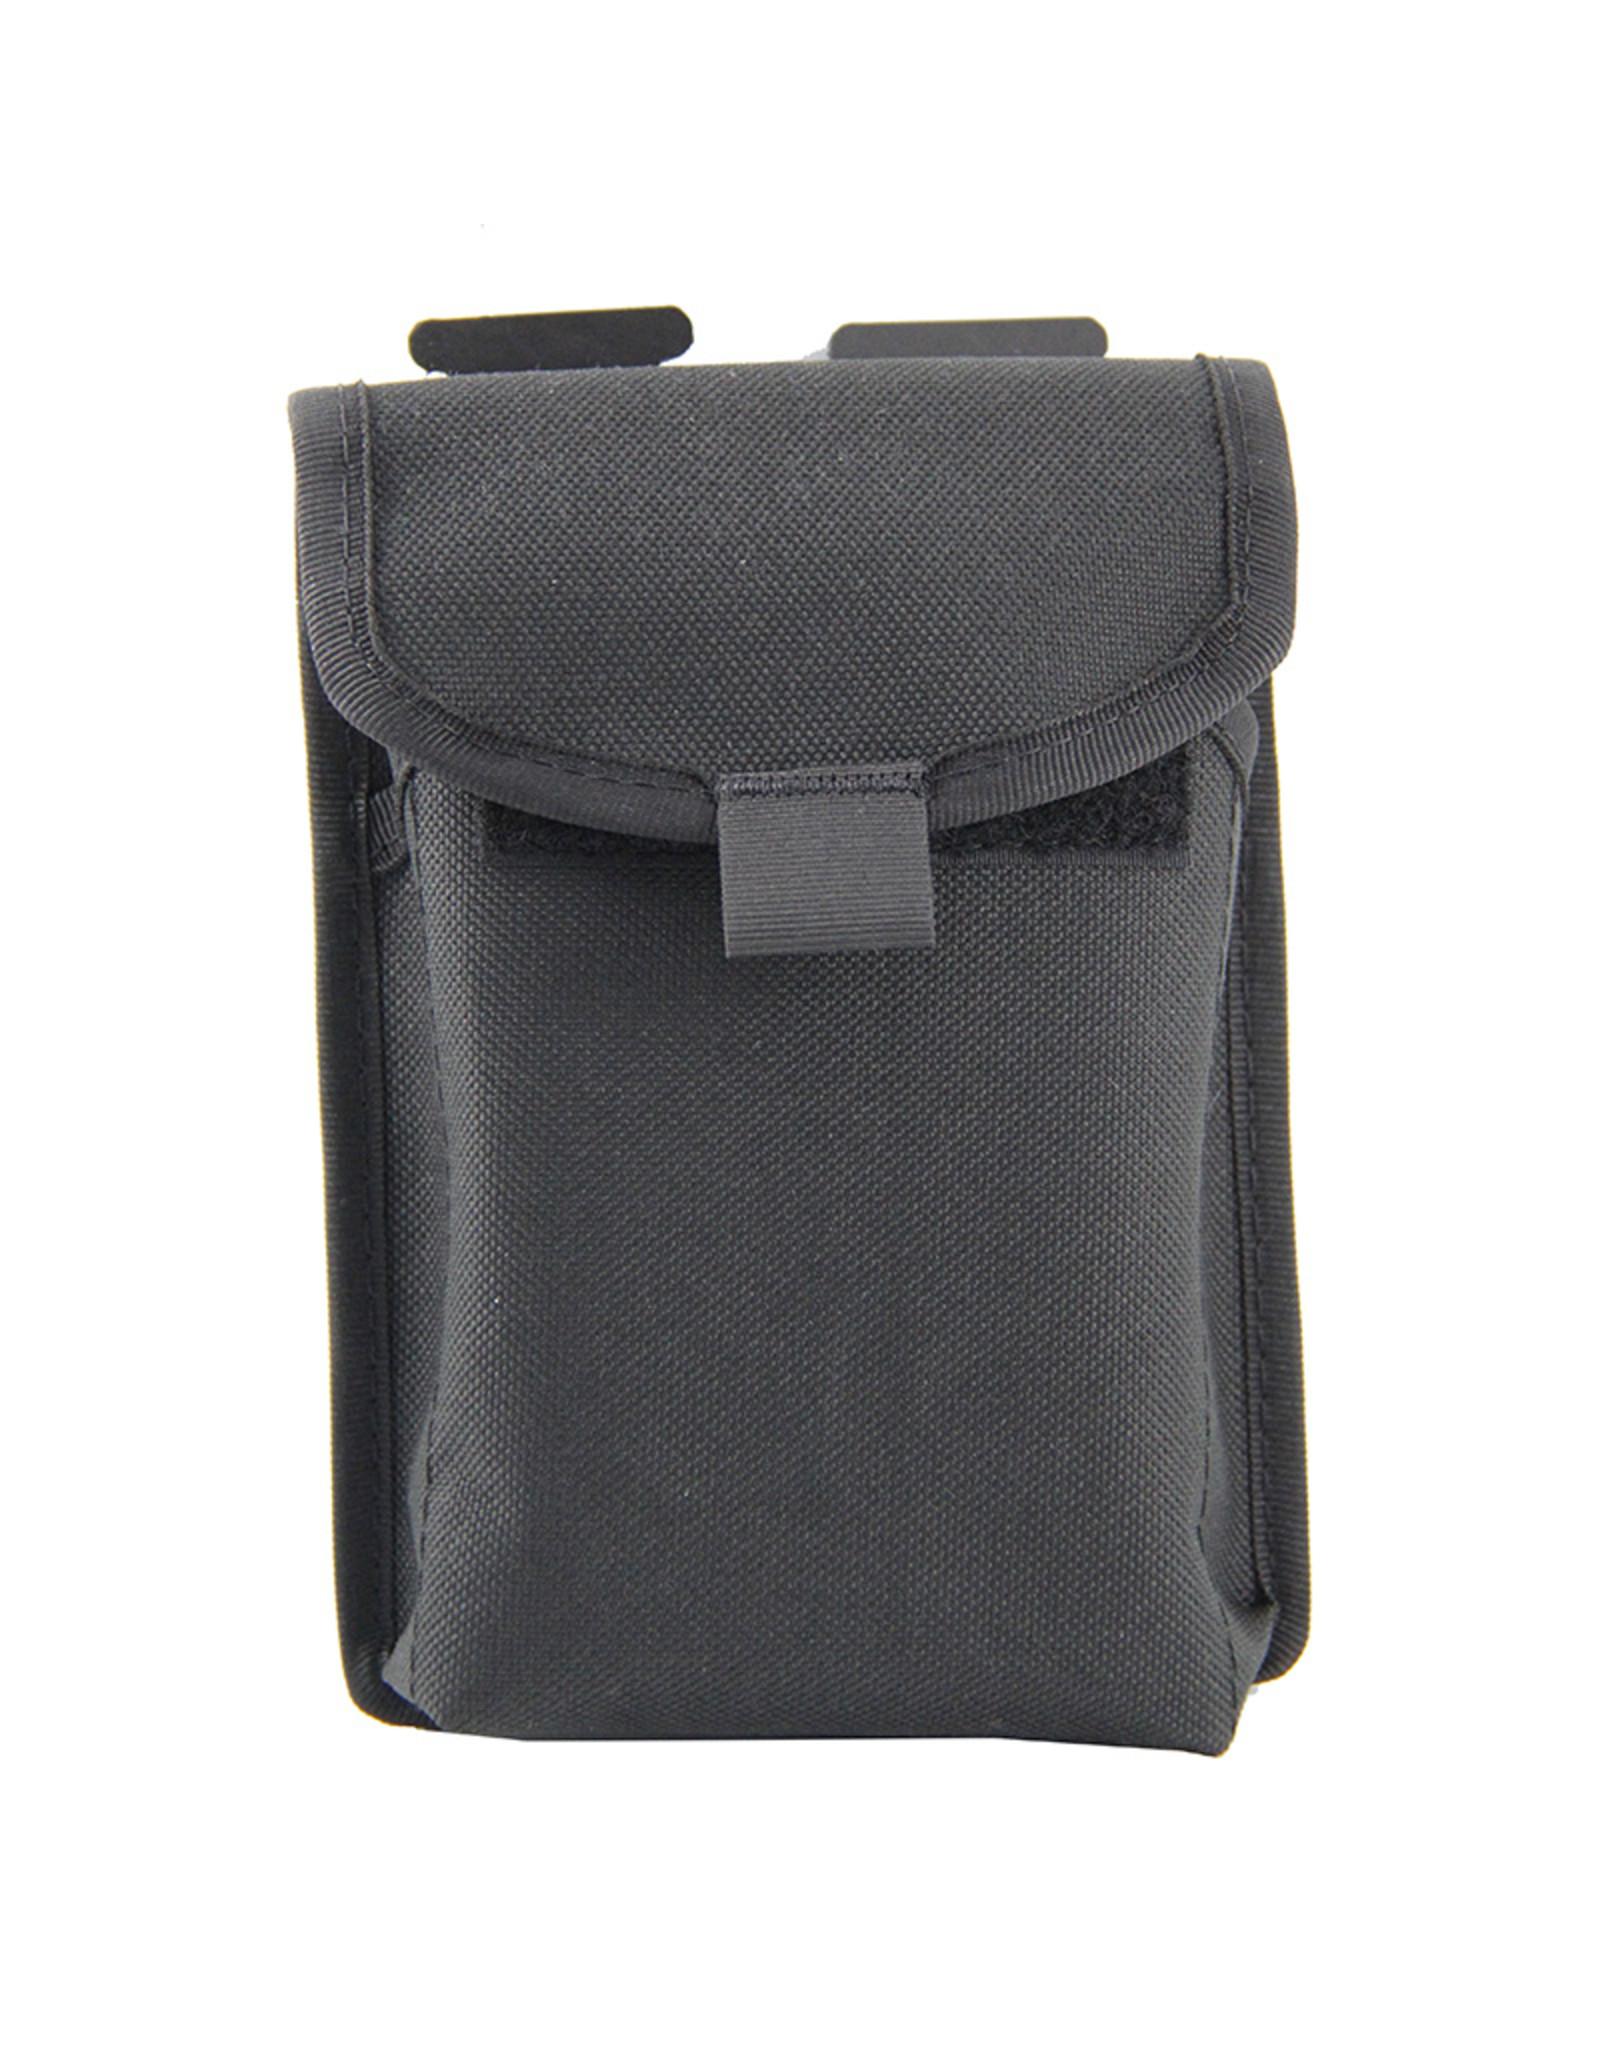 HI-TEC INTERVENTION LOC-Stick Notebook Pouch - HT5070